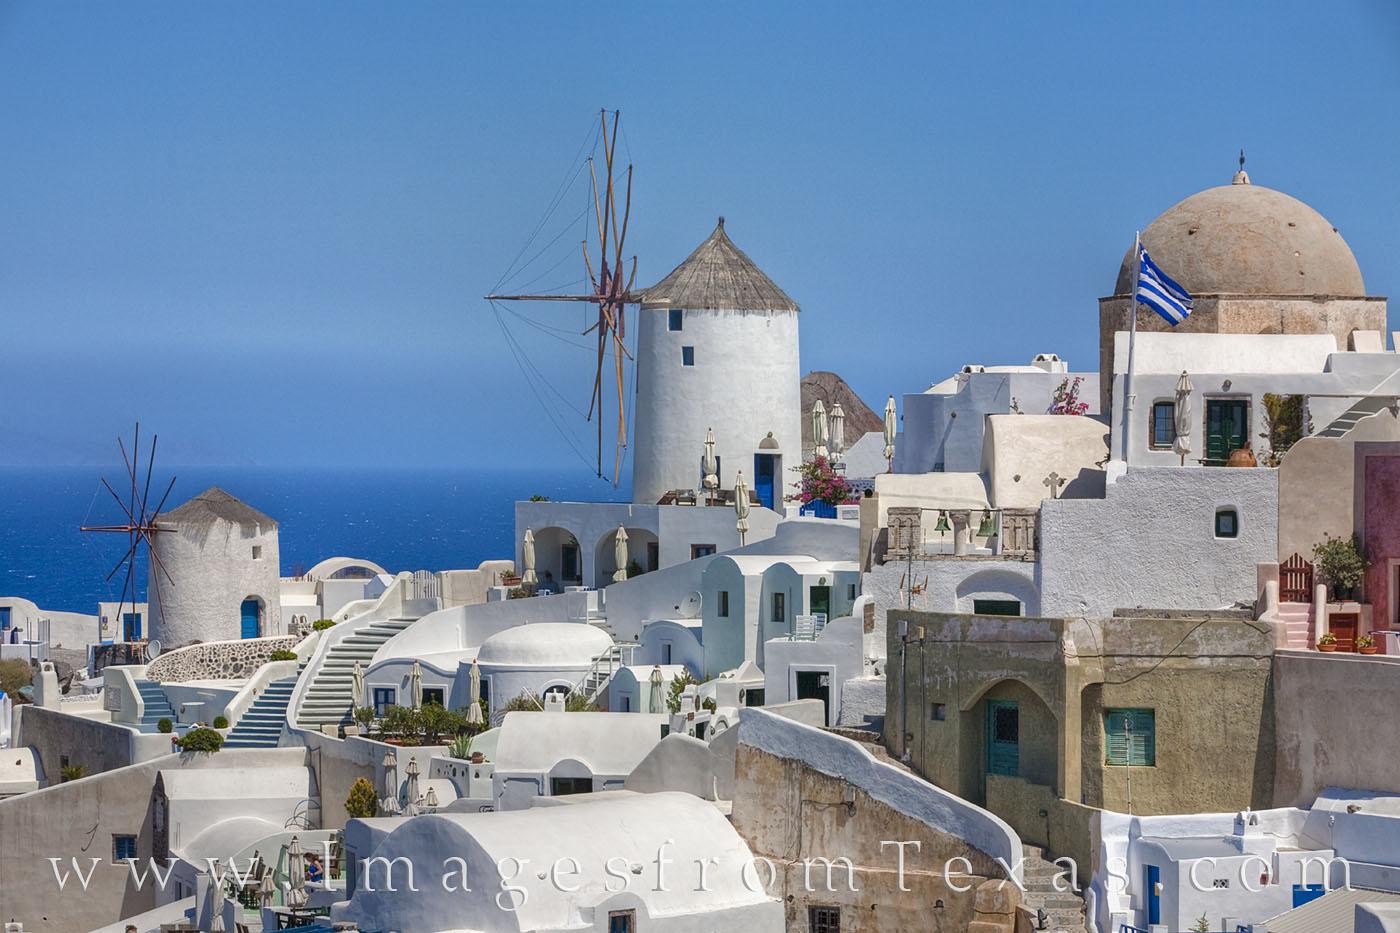 greece, oia, santorini, afternoon, summer, windmills, blue, greek islands, island, travels, photo